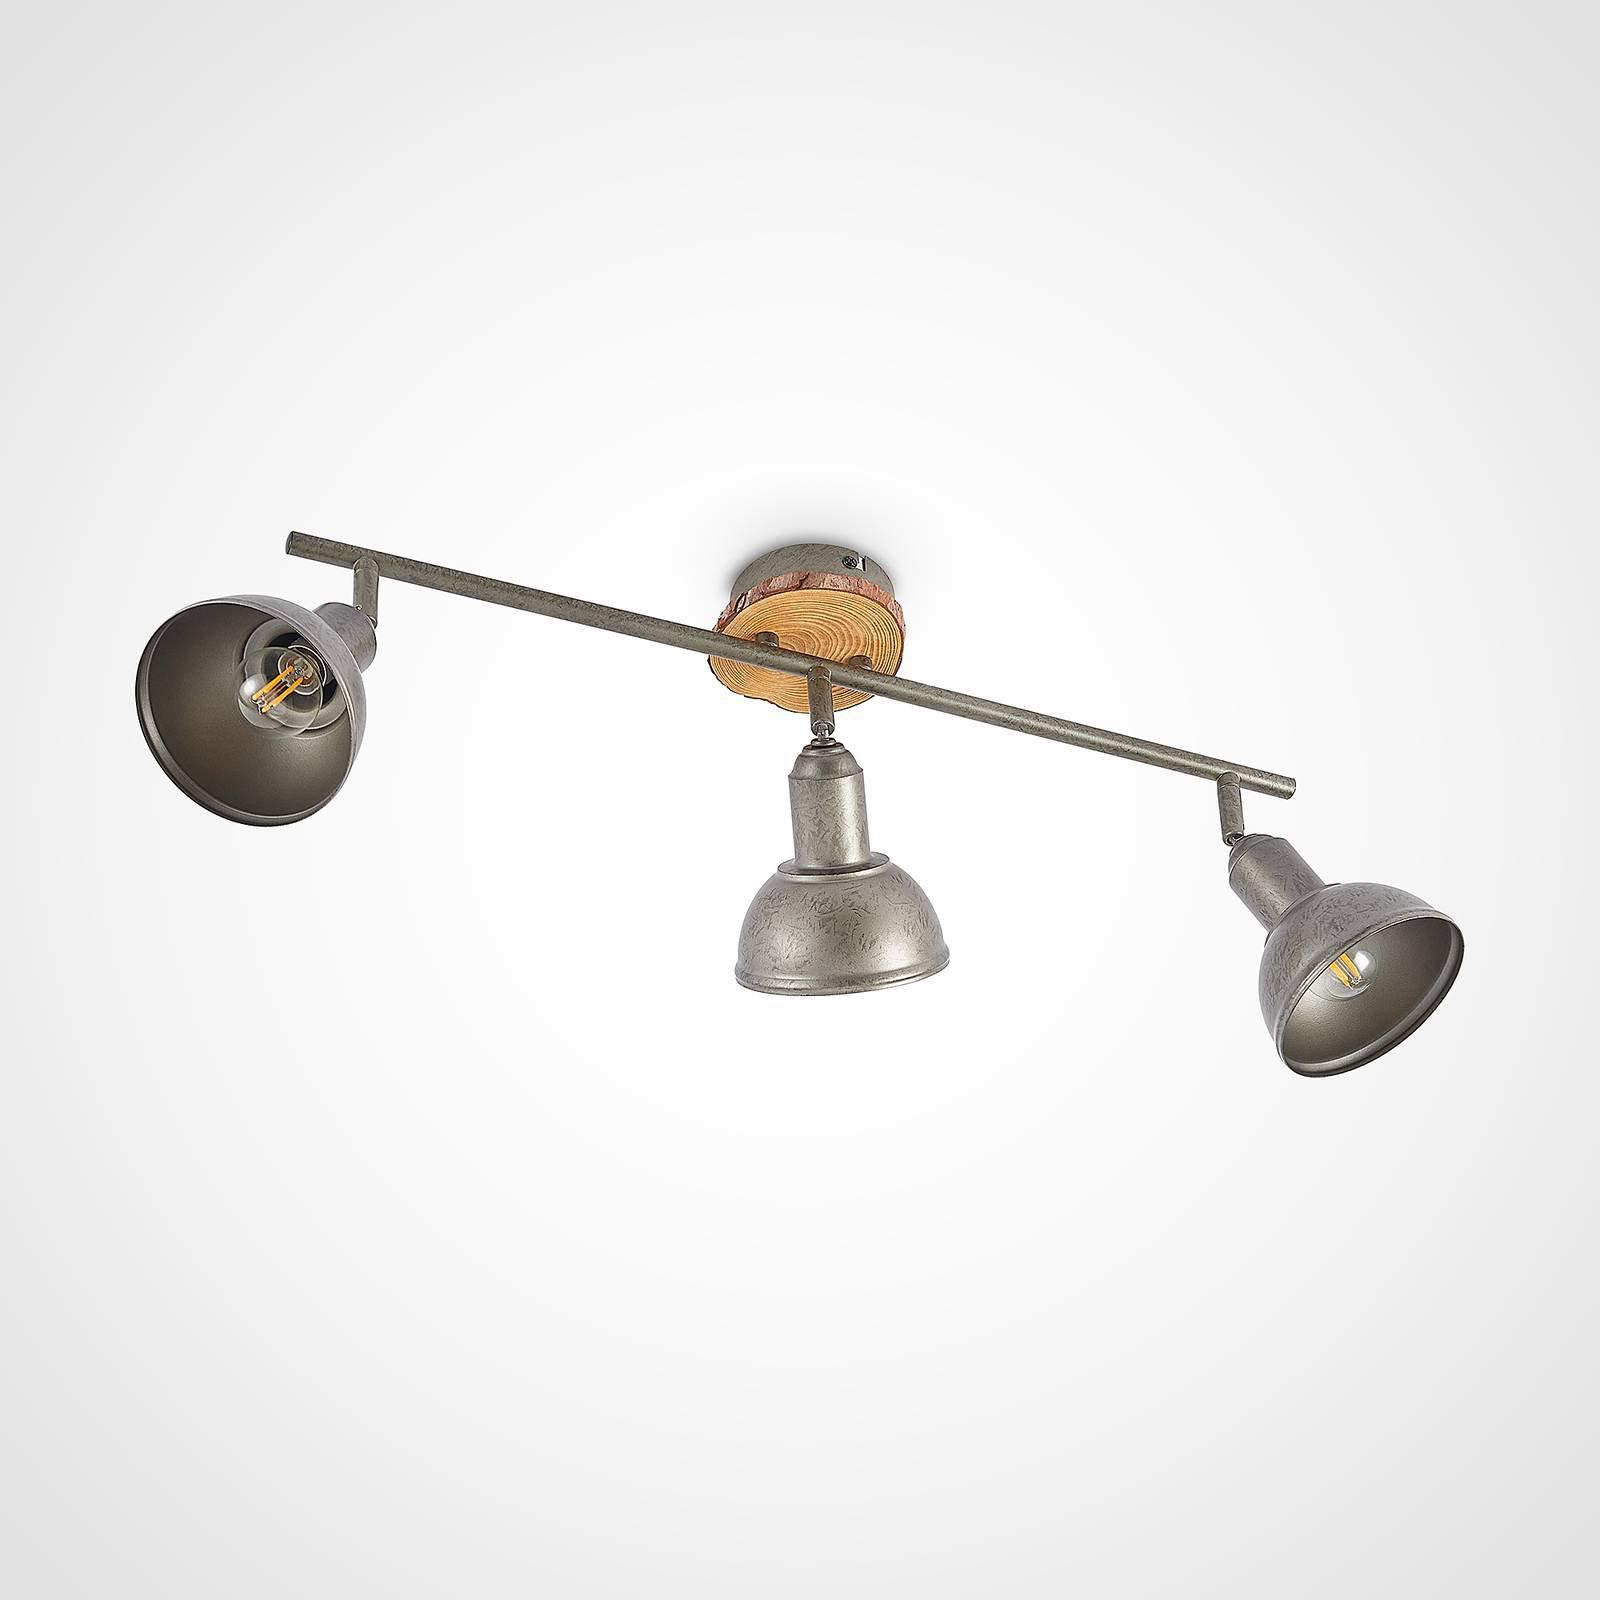 Lindby Nesrin taklampe med treskive, 3 lyskilder